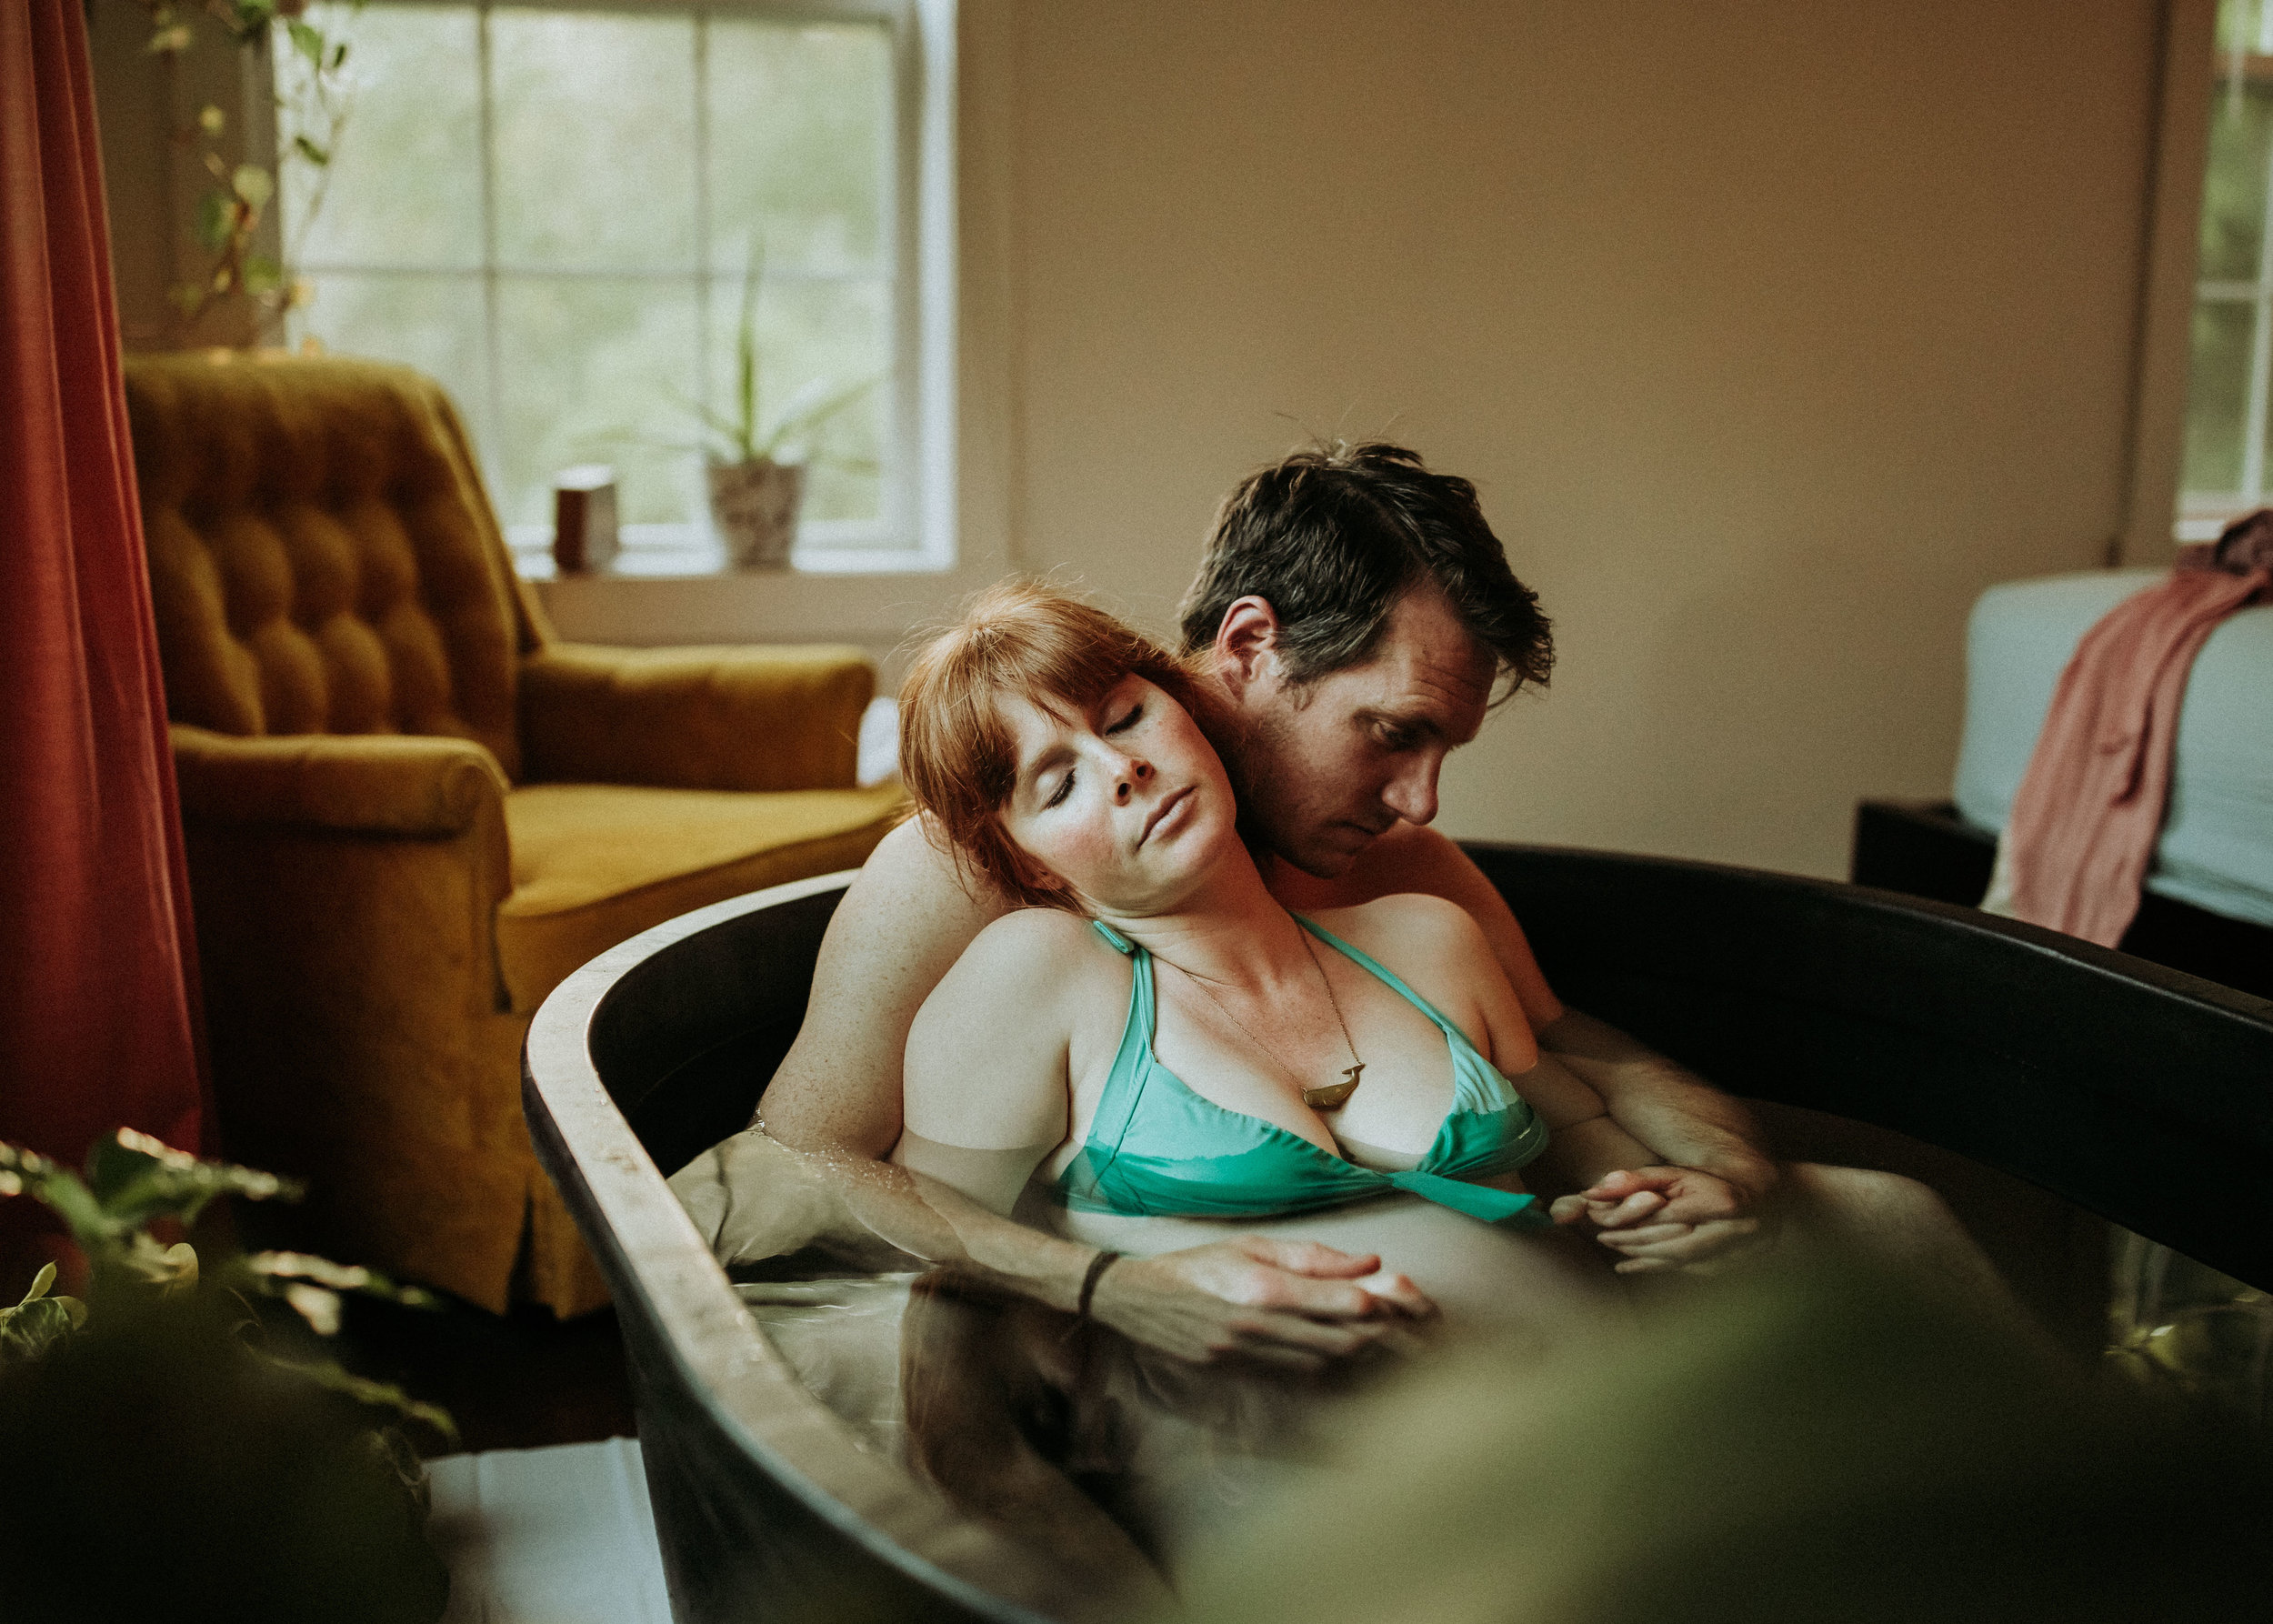 Birth-Photographer-Bellingham-WA-Brianne-Bell-Photograpy-(Daphne)-9.jpg